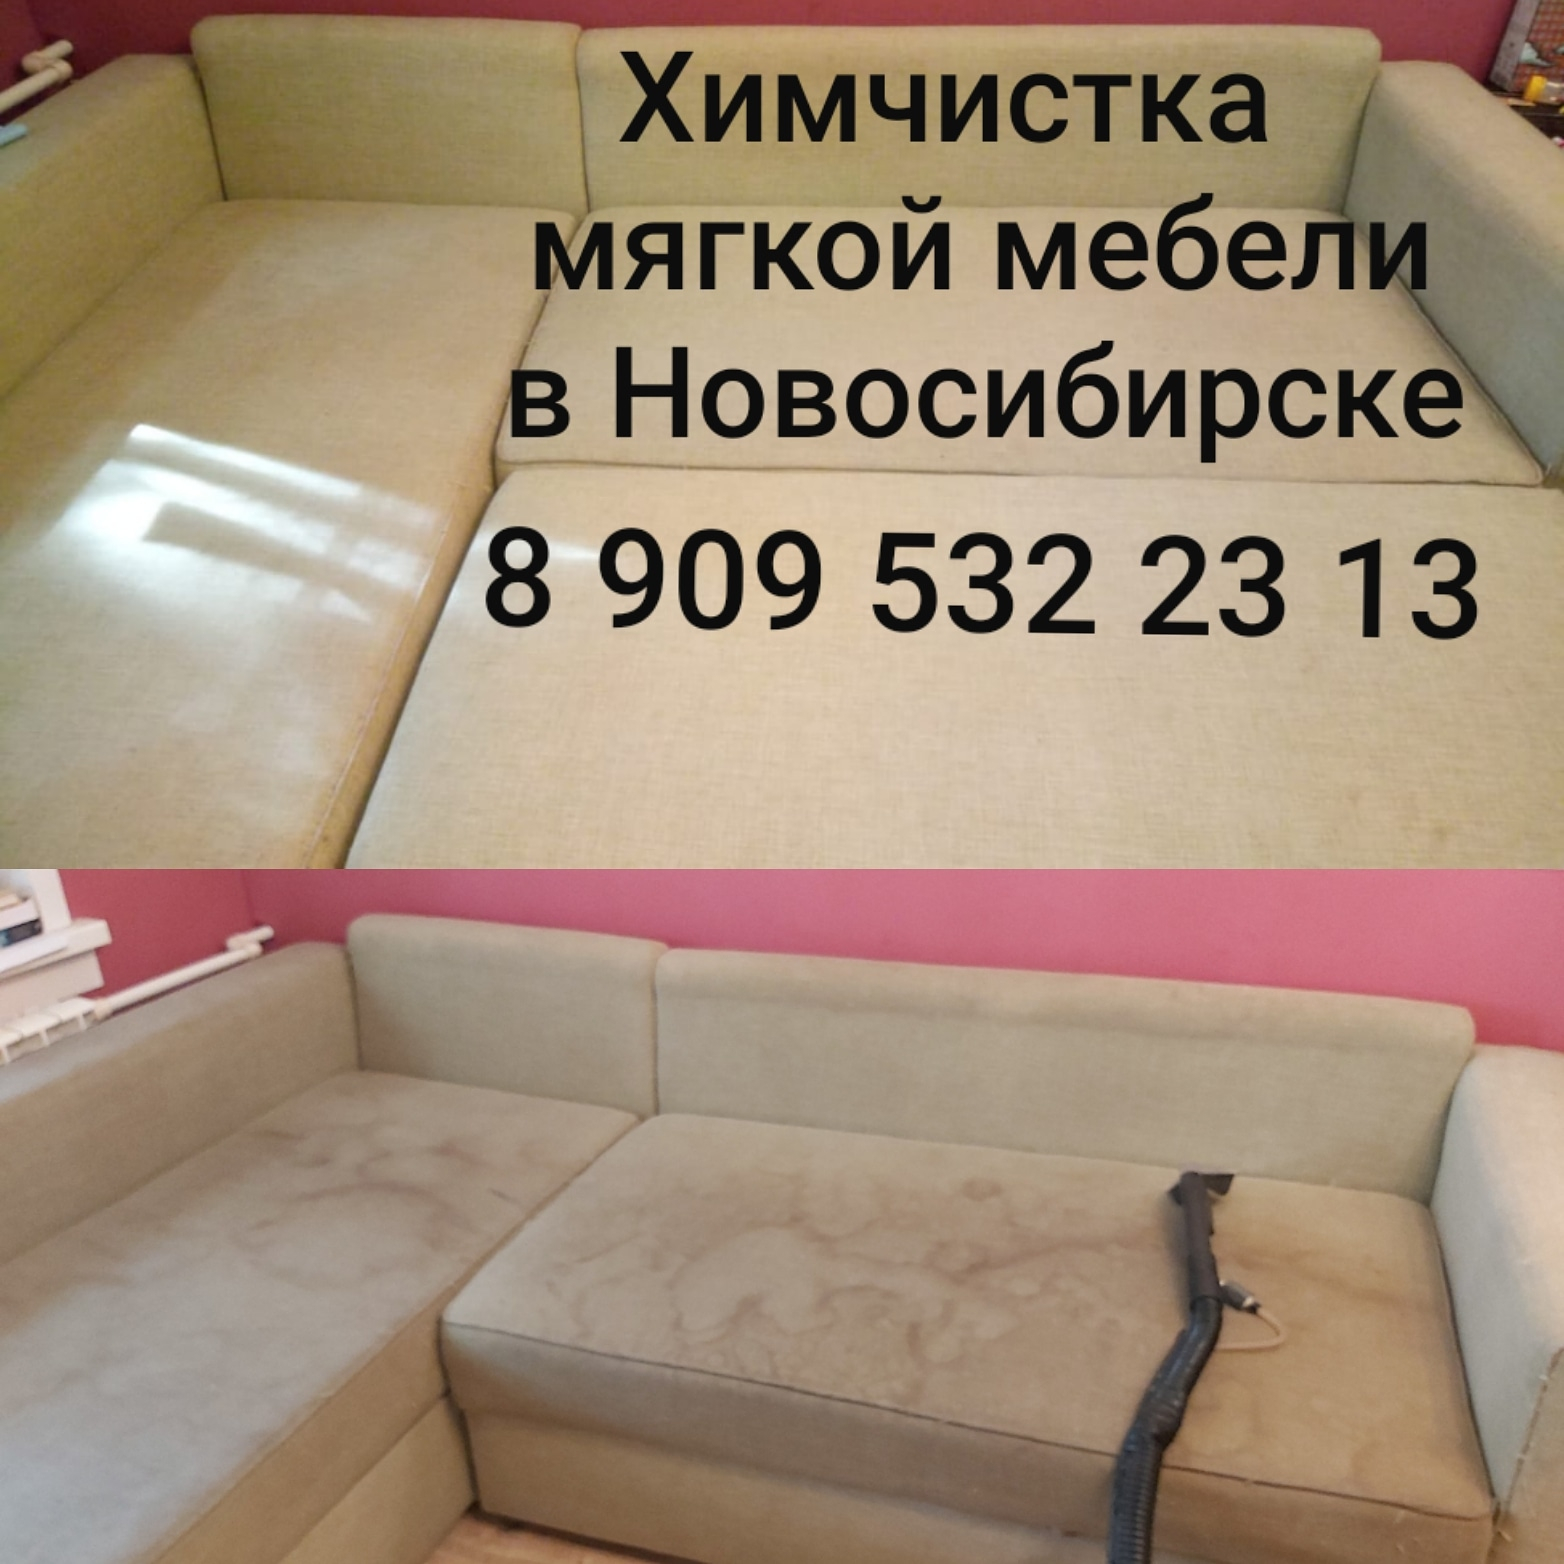 IMG_20200630_121627_264